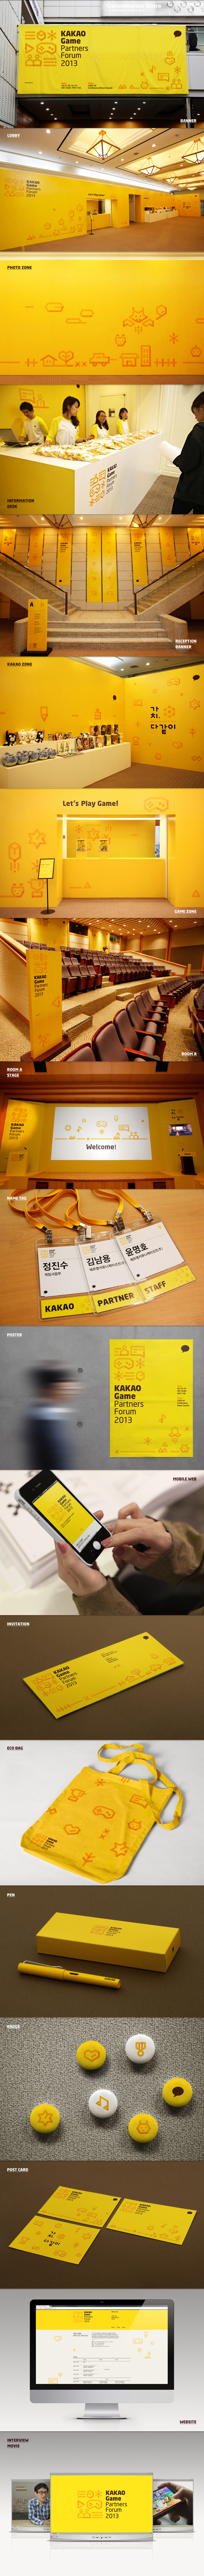 PlusX design Kakao brand identity